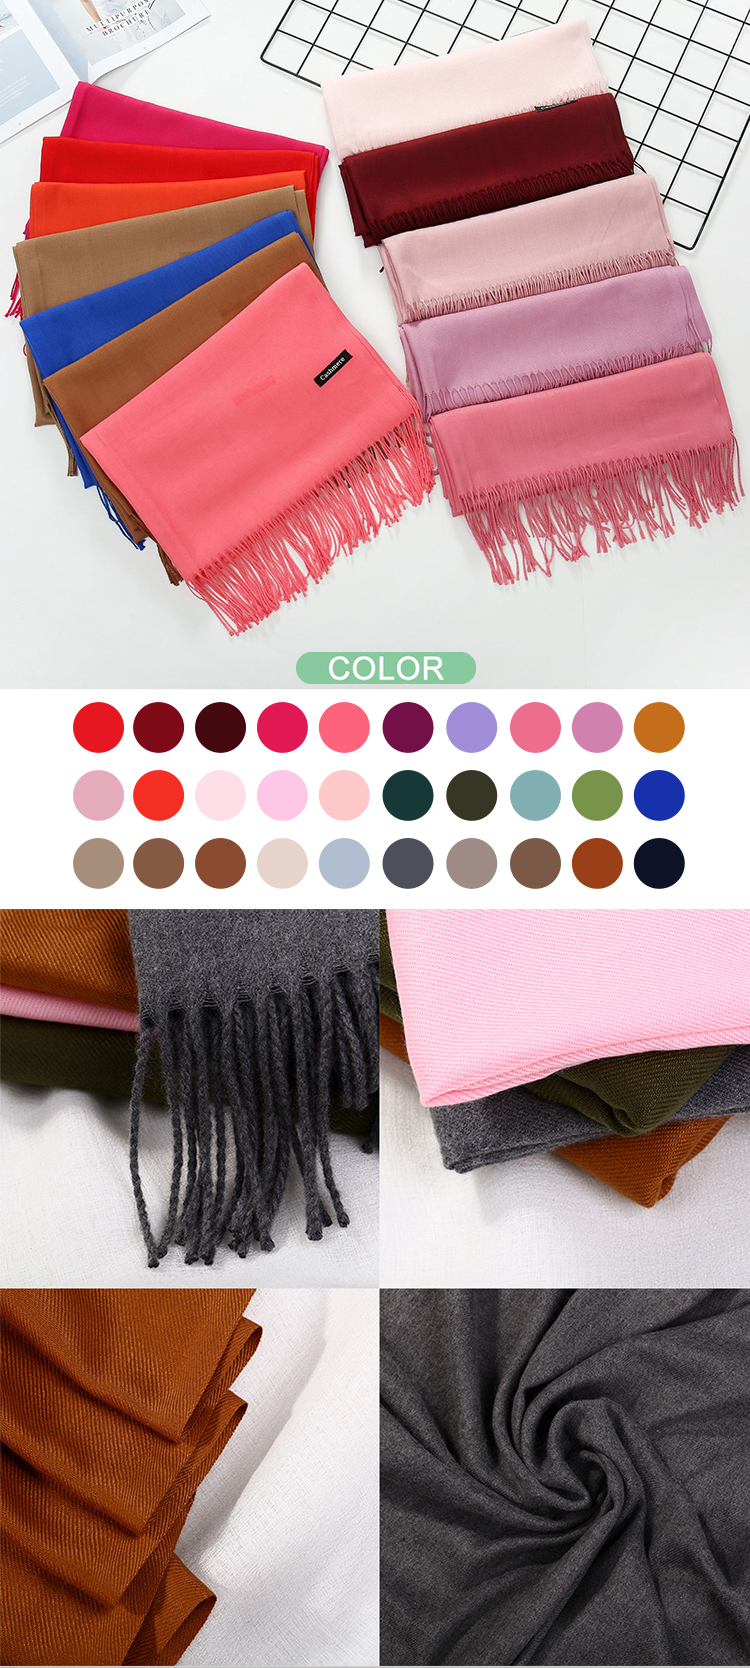 Pas cher pashminas hiver pashmina 100% foulards en cachemire